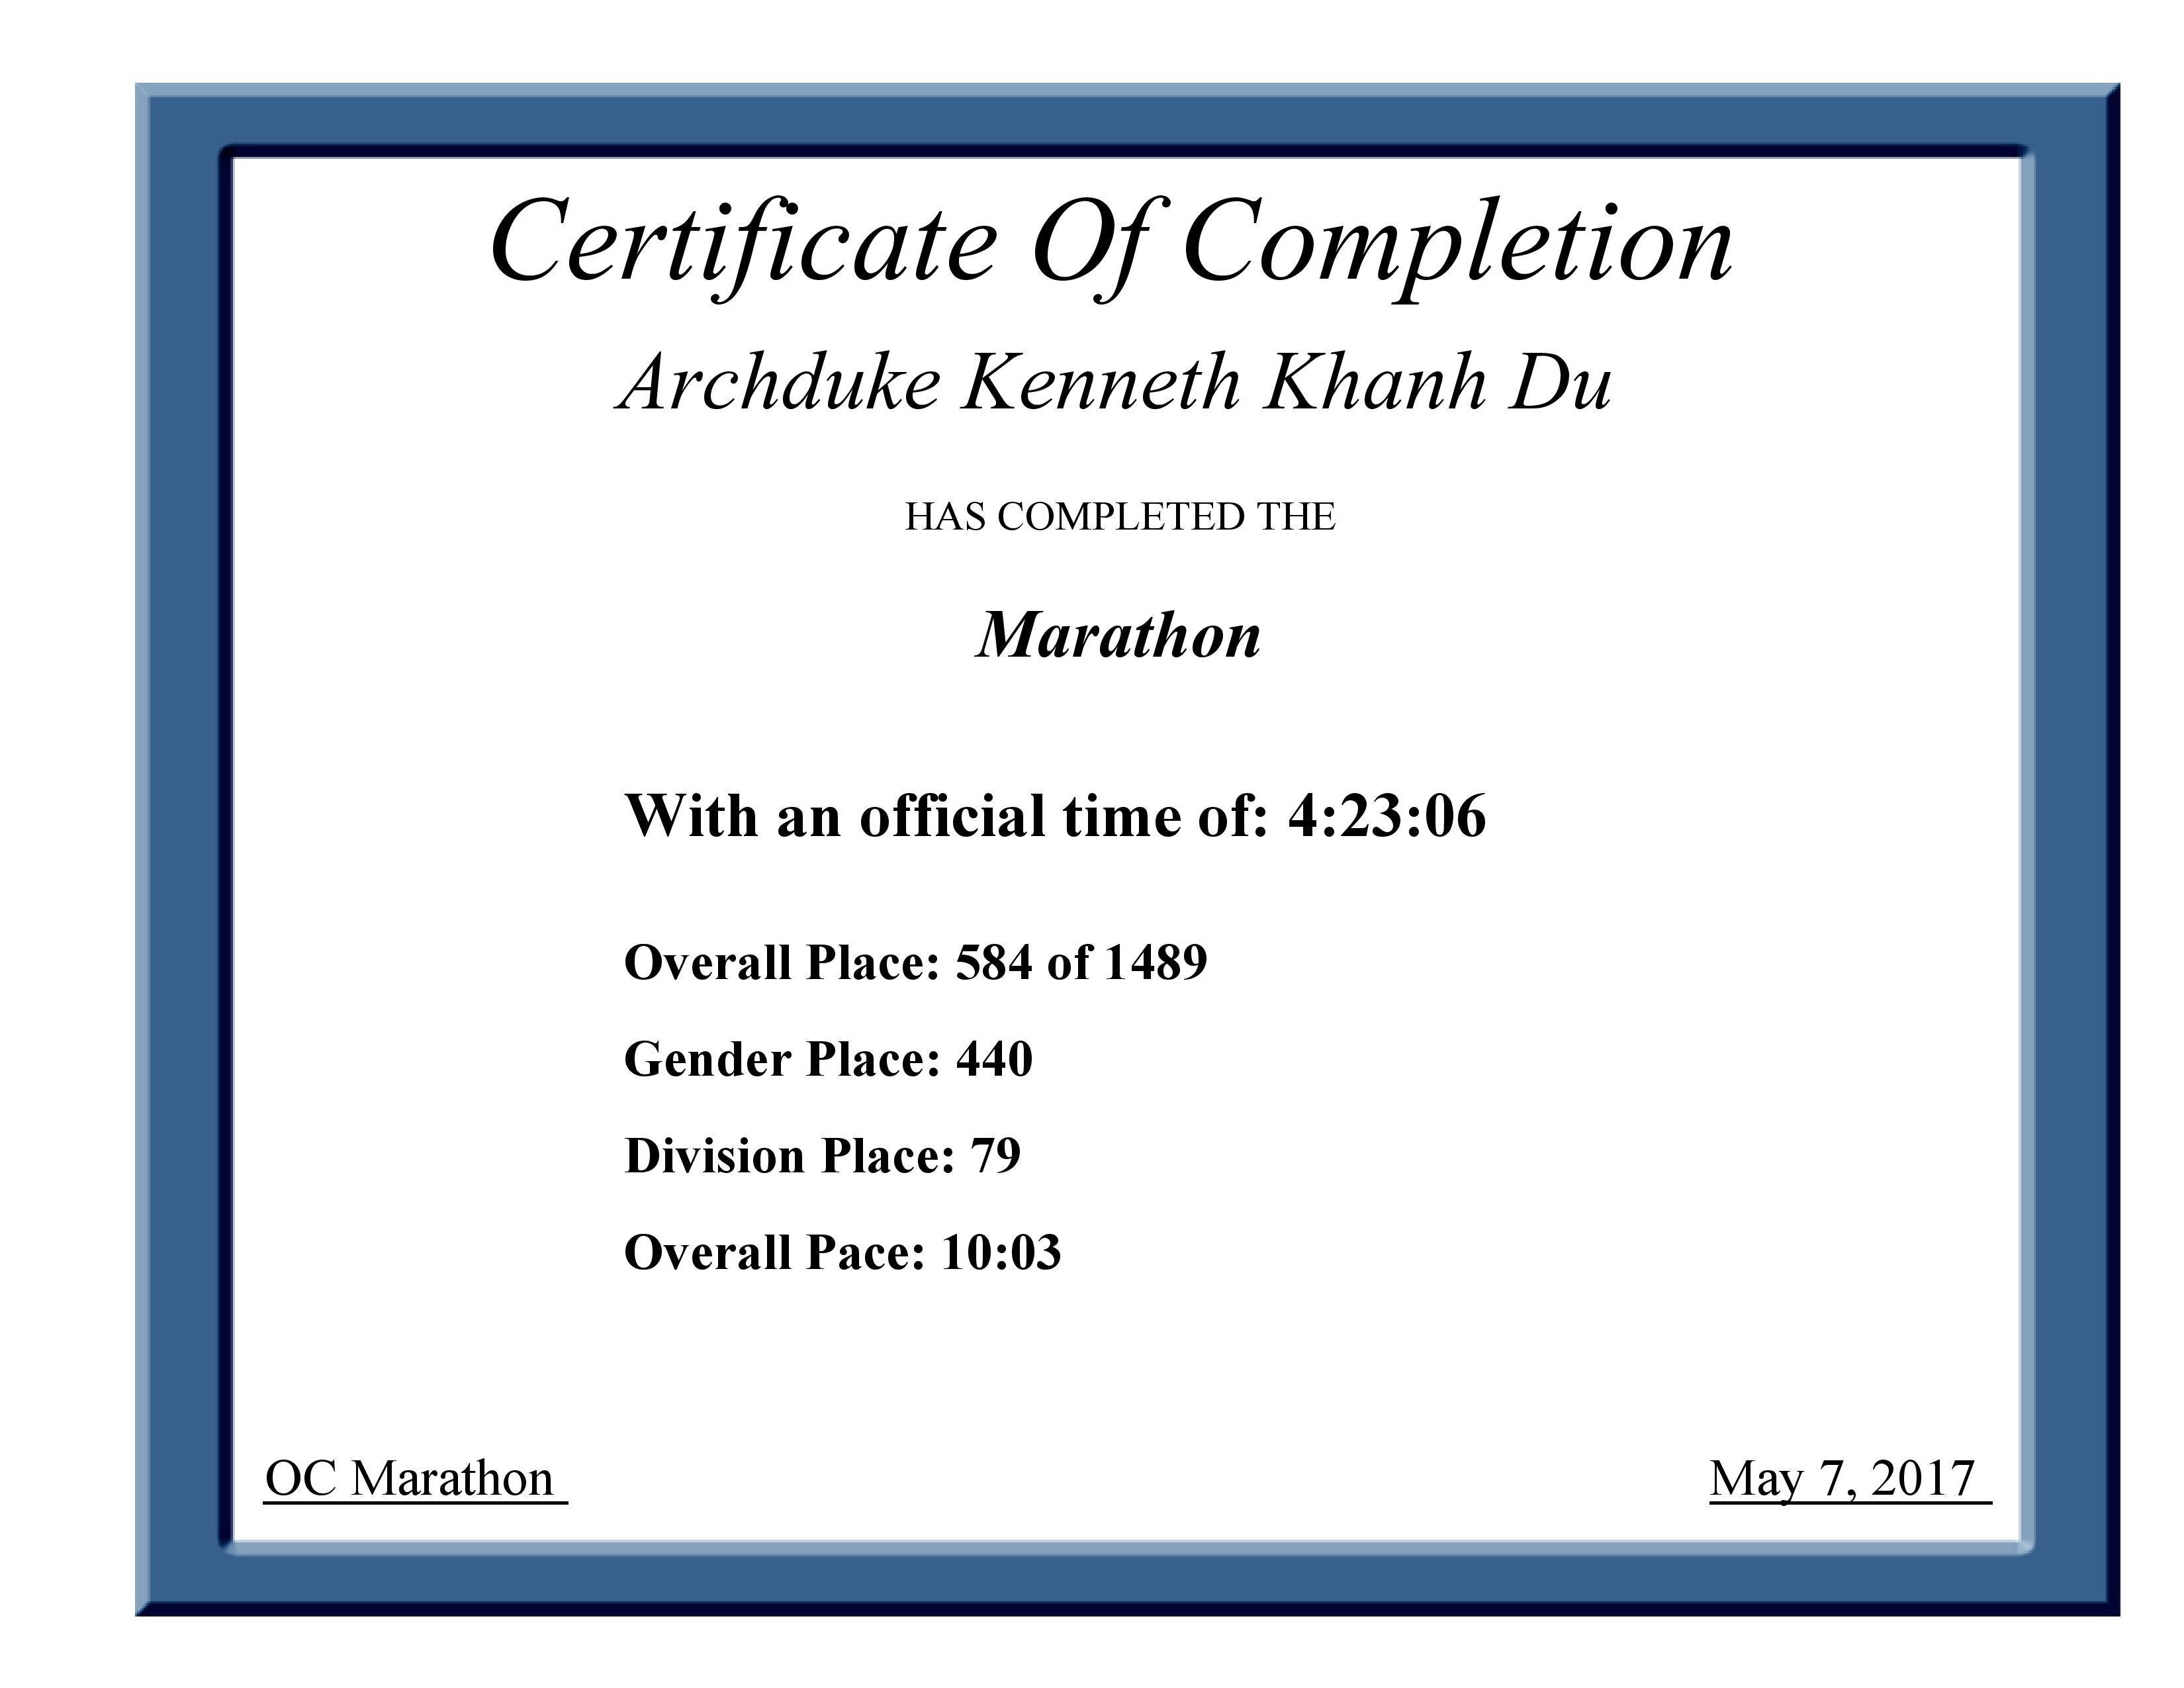 2017 U Bank Oc Marathon Finisher Certificate Archduke Kenneth Khanh Du Of Completion Author May 7th Sonnet 154 Paraphrase